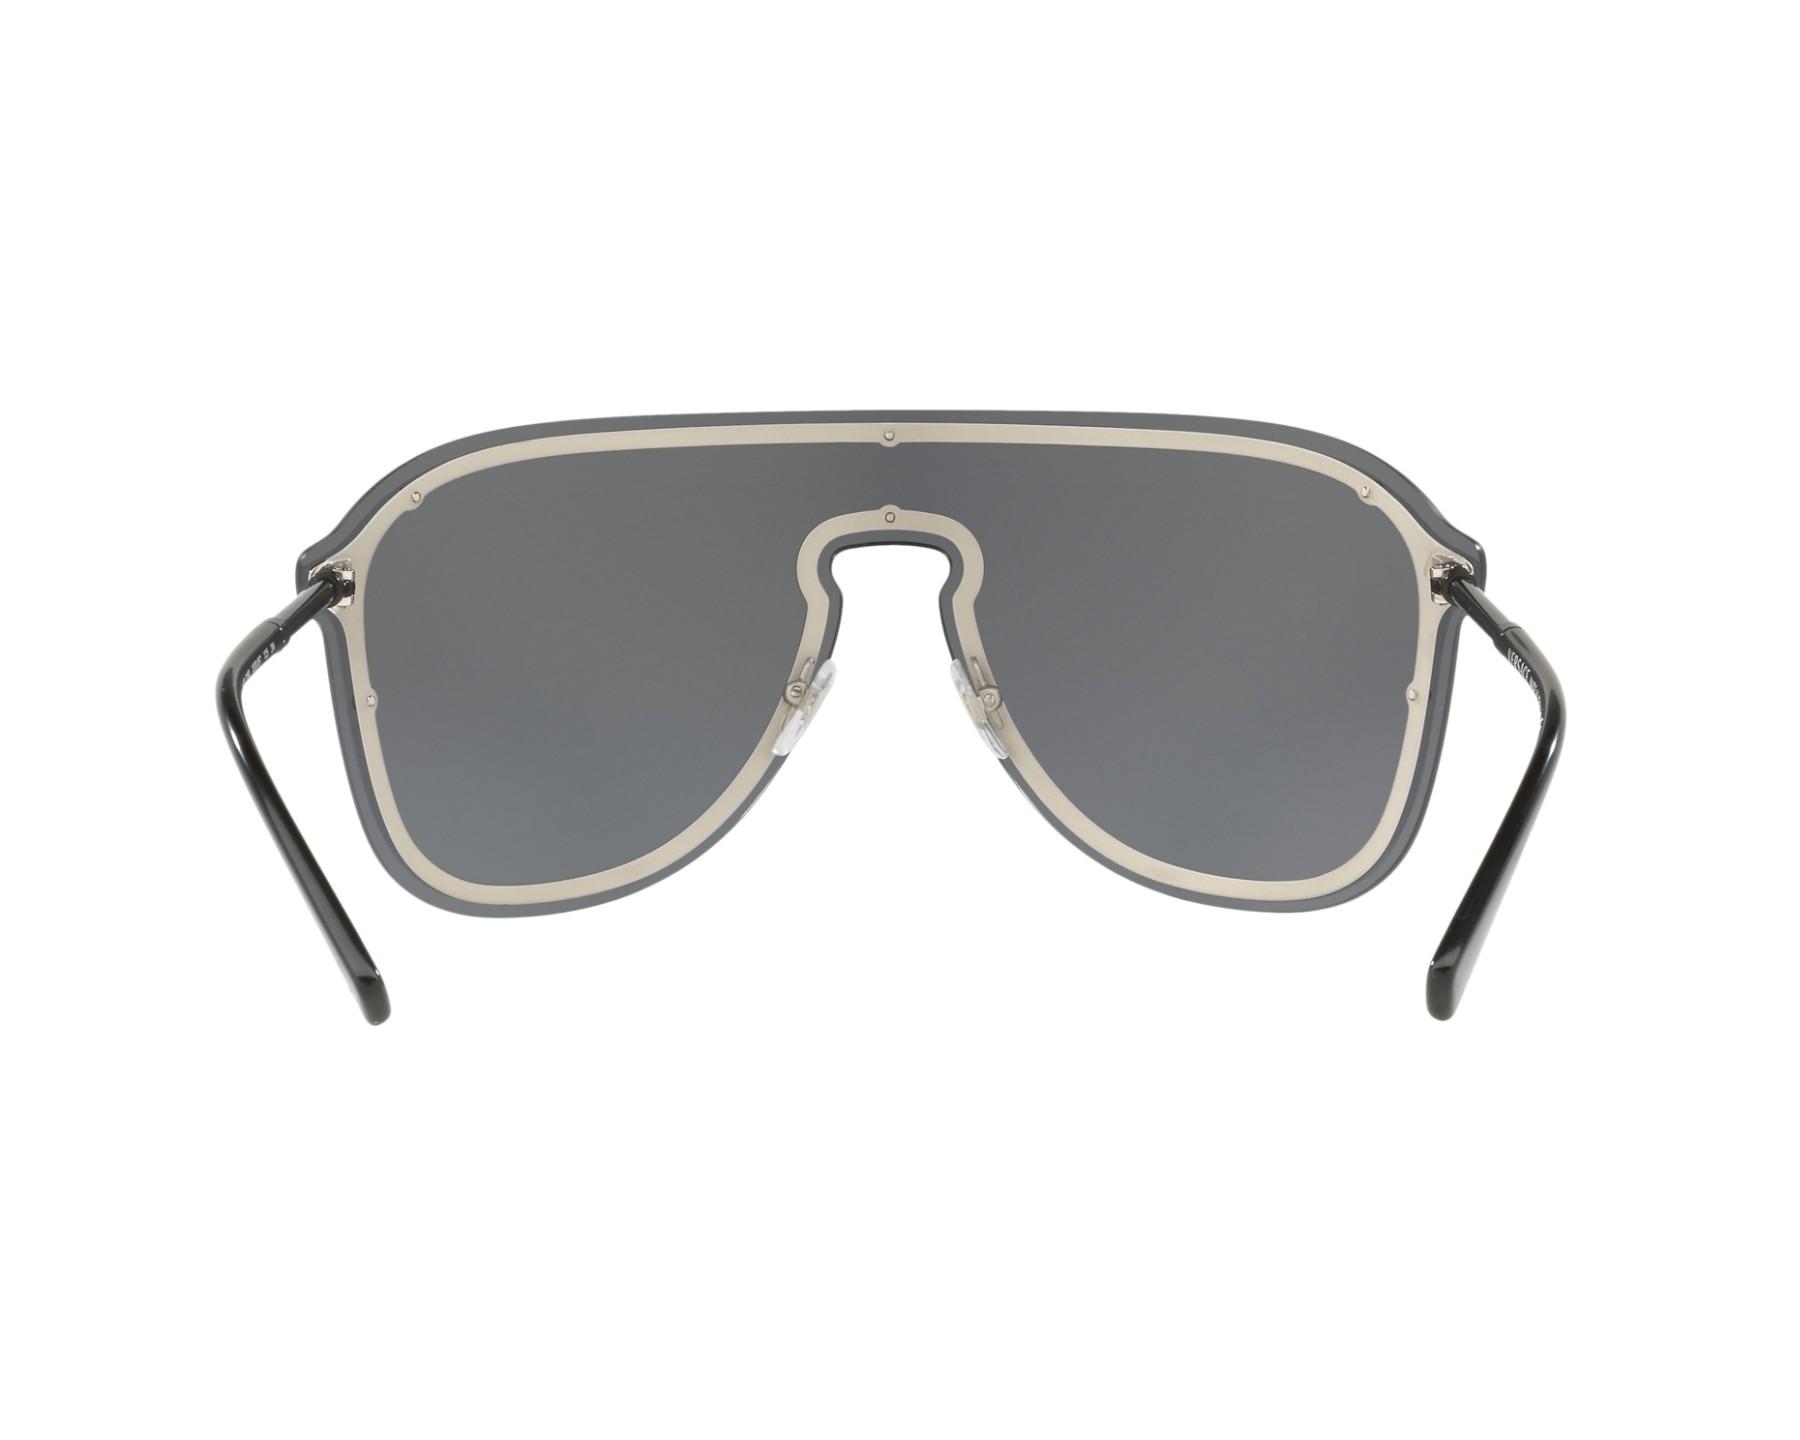 0b3cccb76d Sunglasses Versace VE-2180 100087 44- Black 360 degree view 7